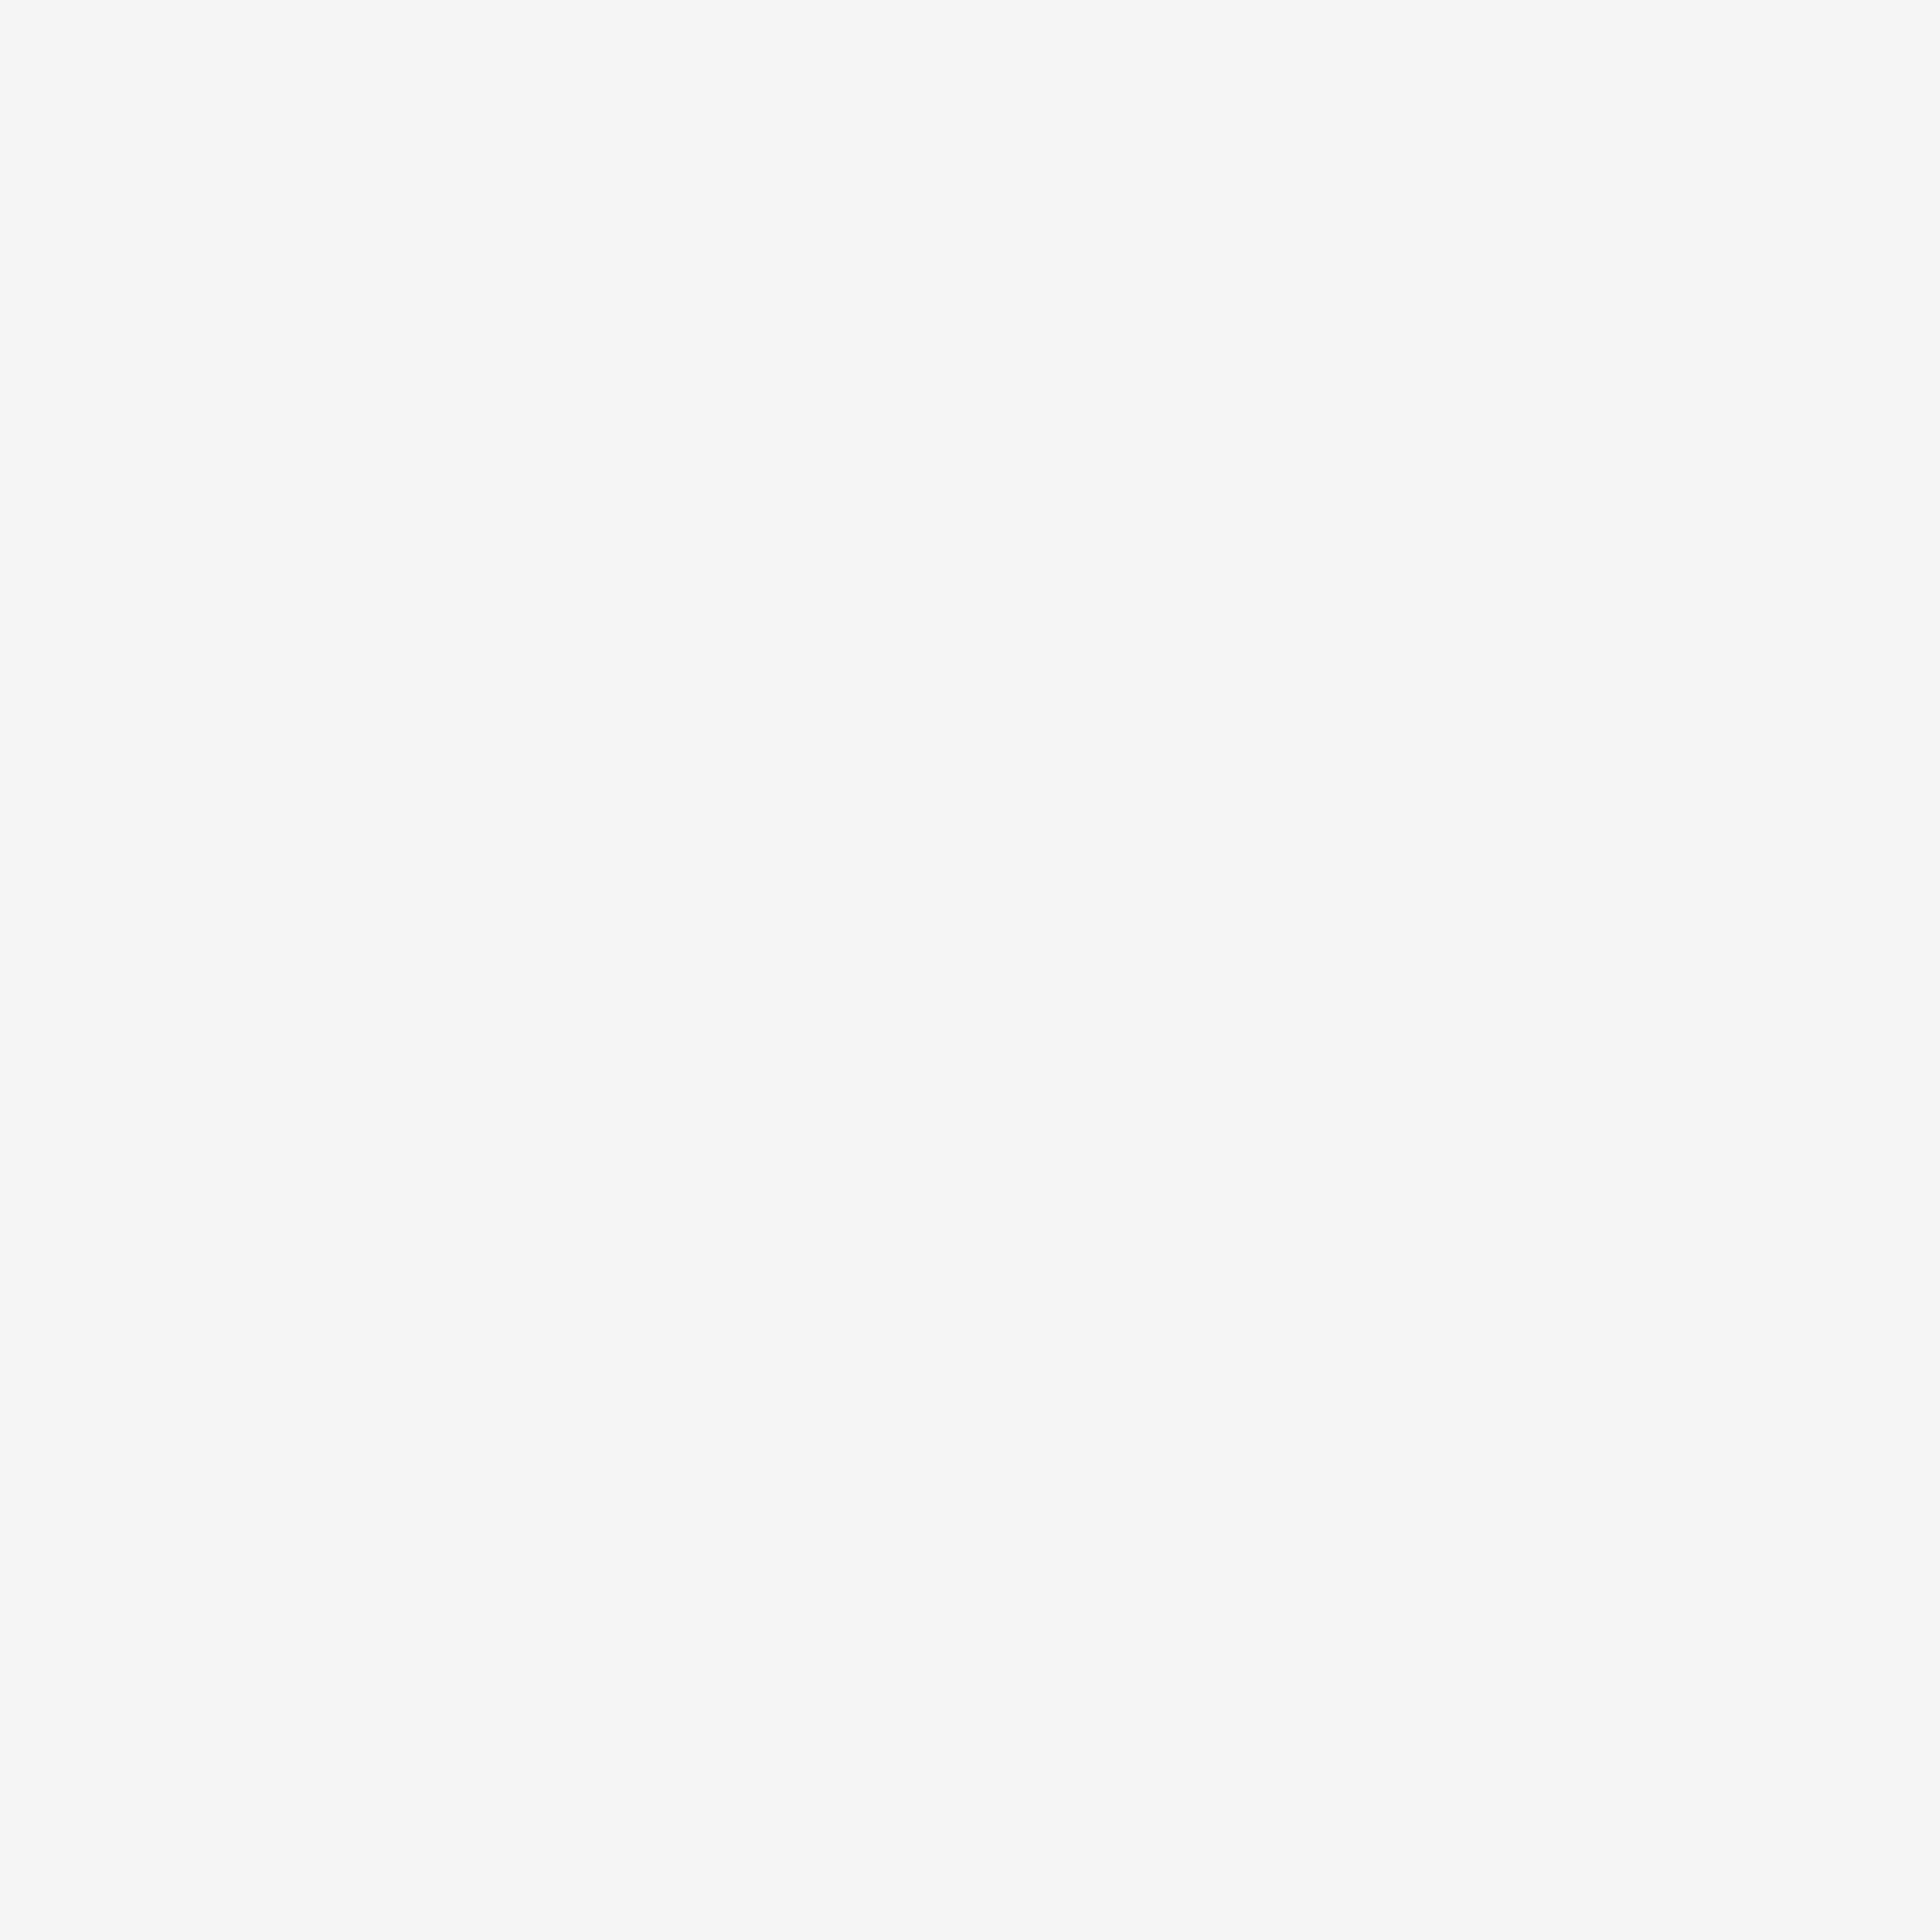 adidas ace 17.3 fg voetbalschoenen zwart heren